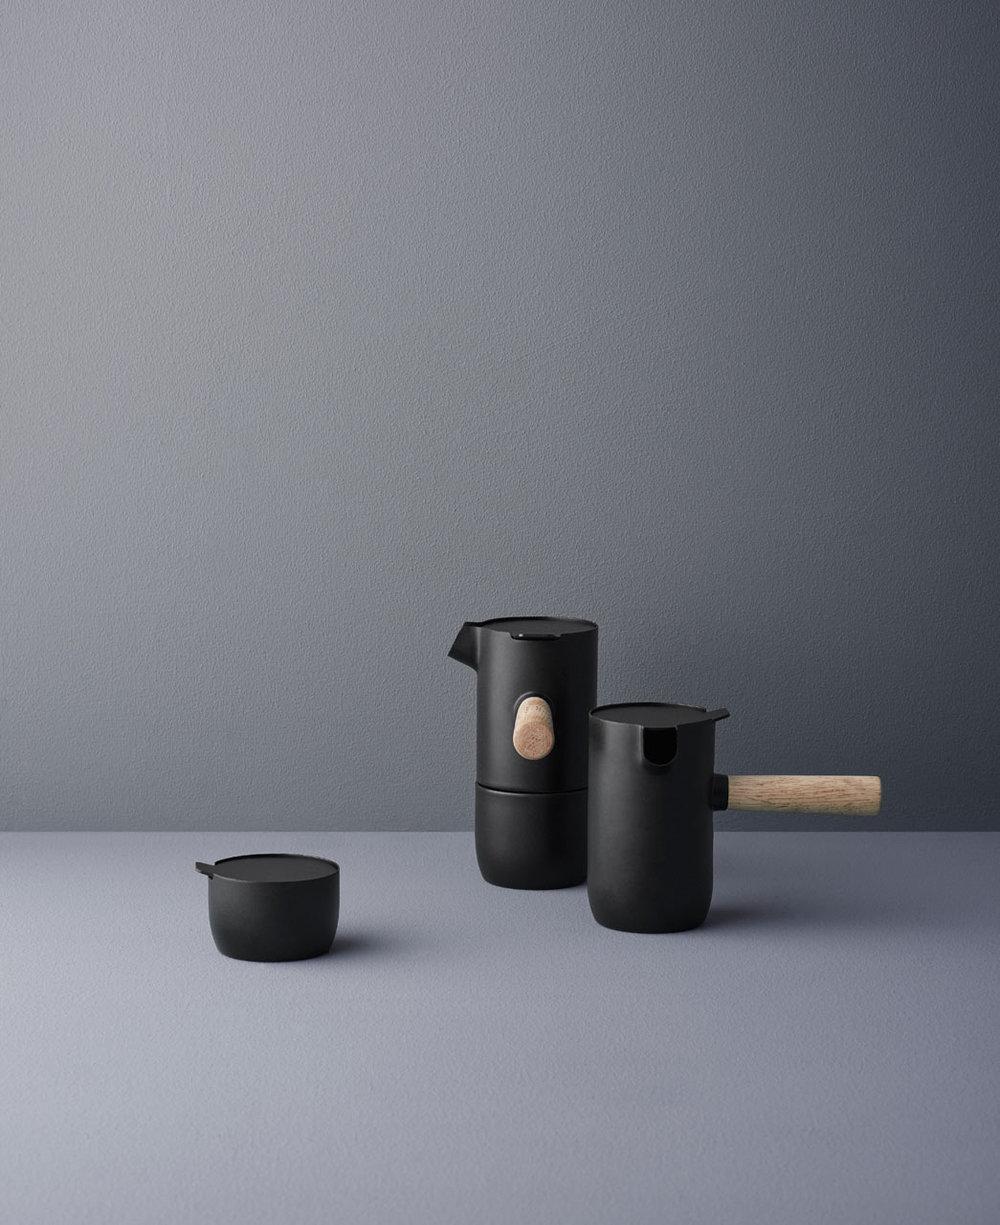 Collar-Coffee-brewer-Stelton_dezainaa_2